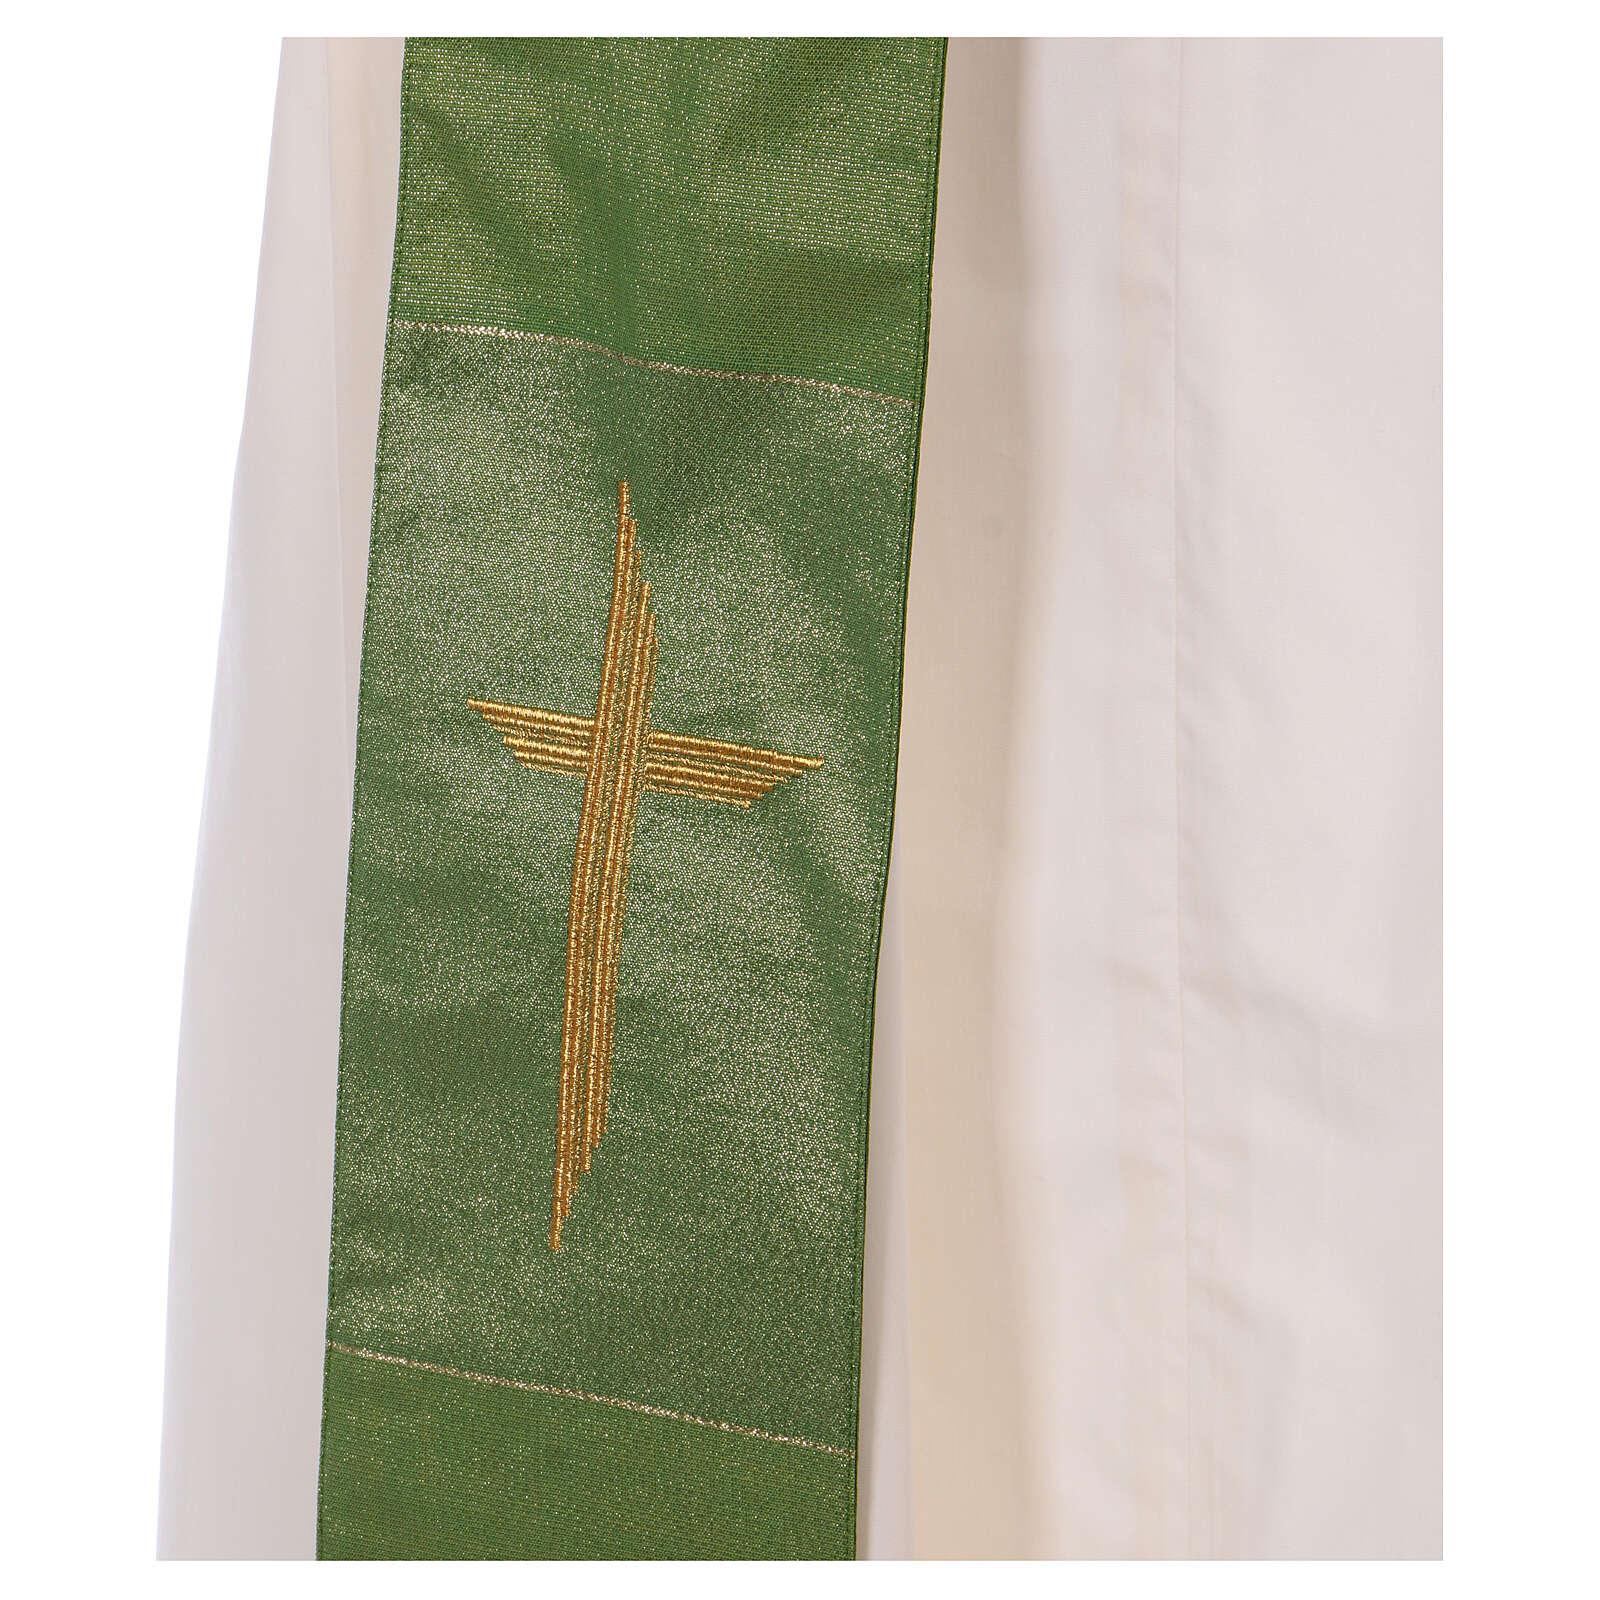 Estola diaconal 85% lã 15% lurex cruz dourada 4